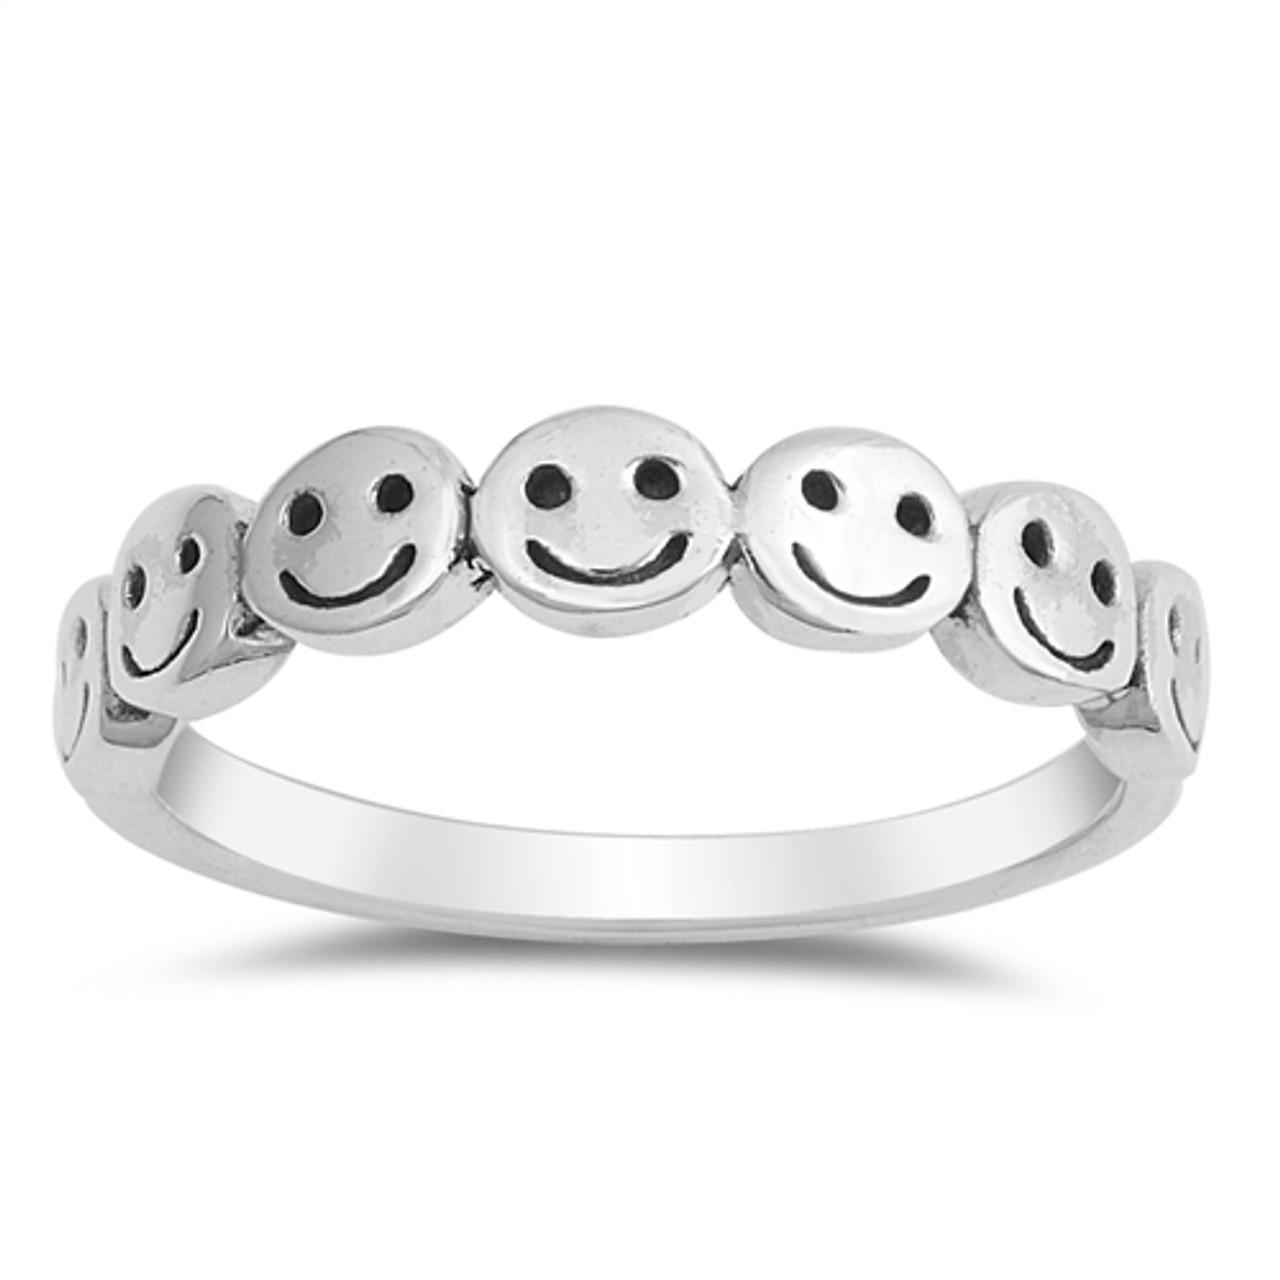 Adjustable Metal Stamped Ring  Smiles Face